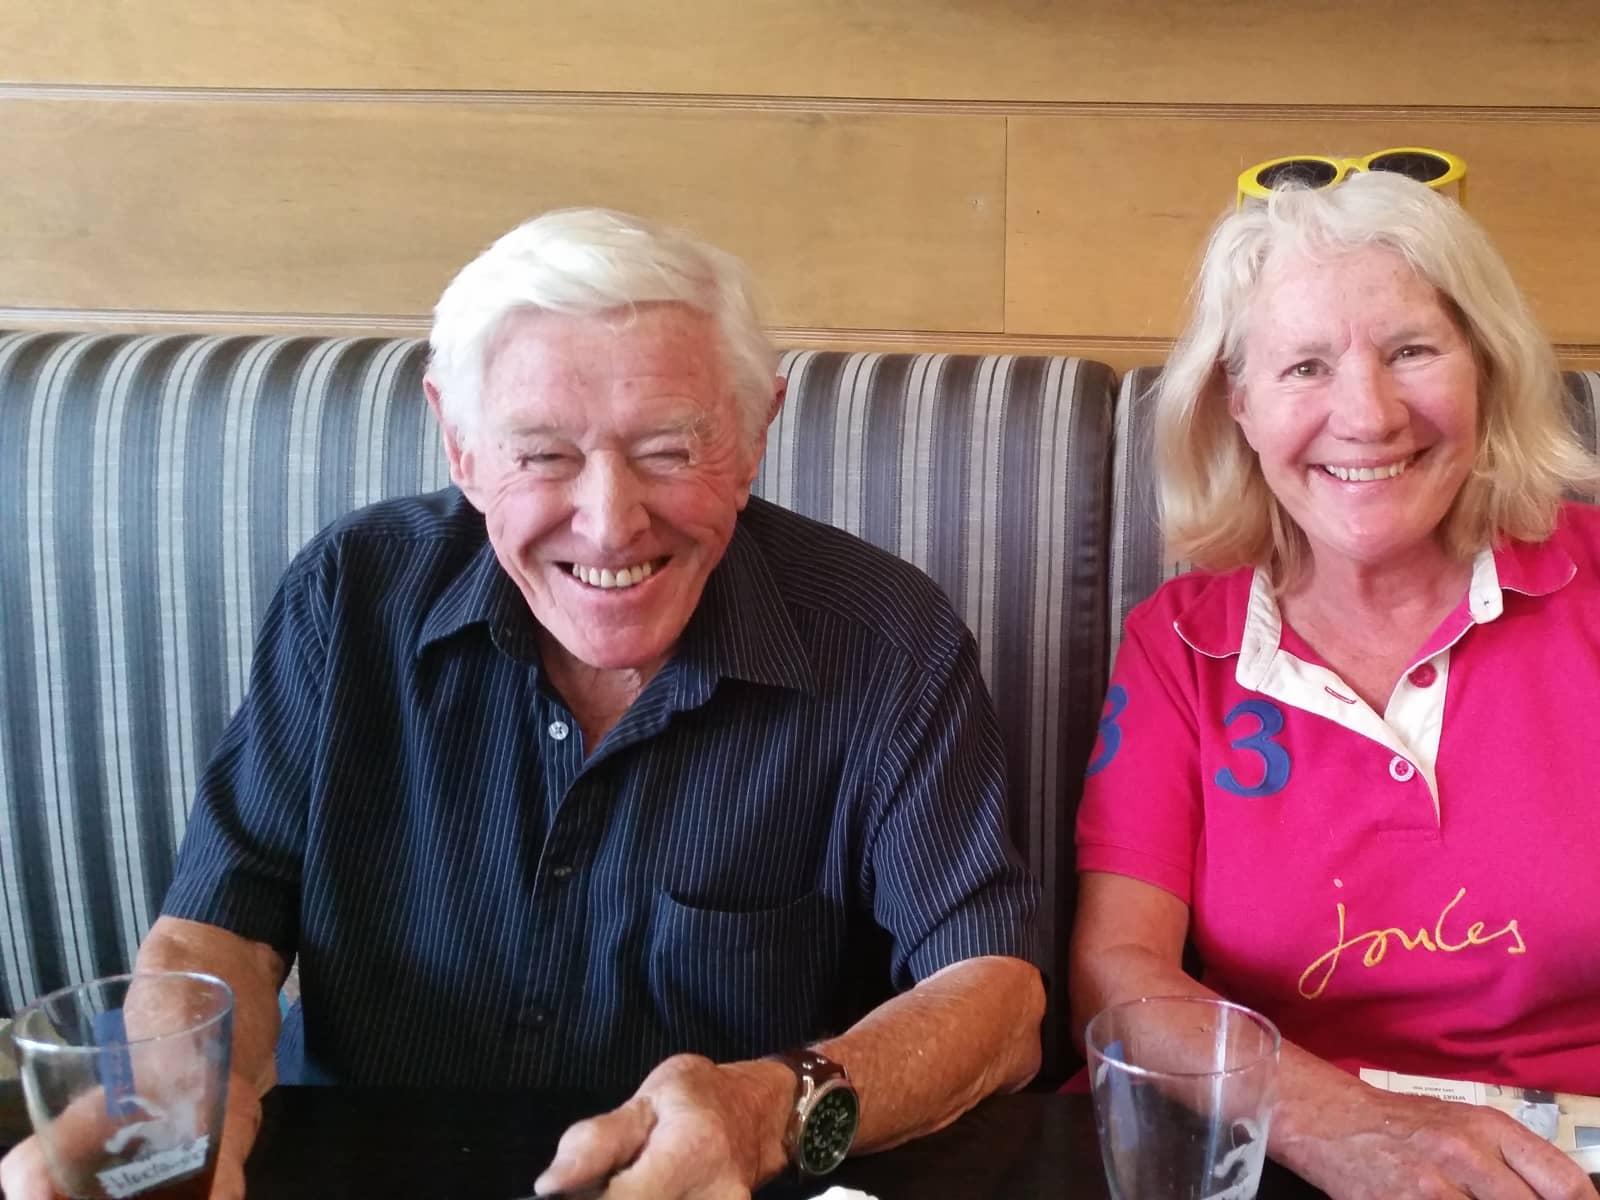 Brian & Julie from Dunkeld, Victoria, Australia